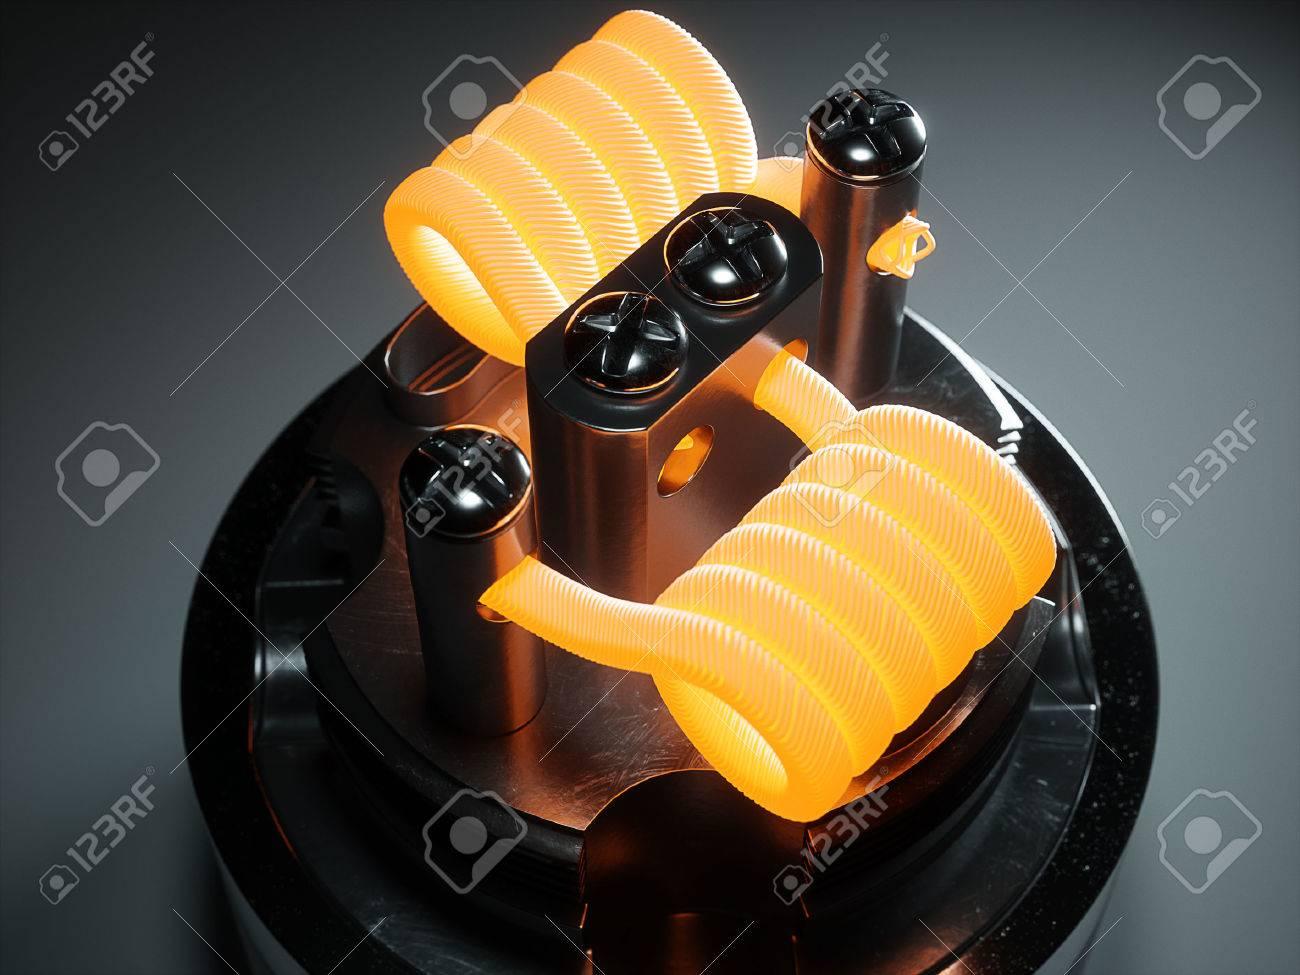 Vaping atomizer with clapton coil. Black background Standard-Bild - 60457624